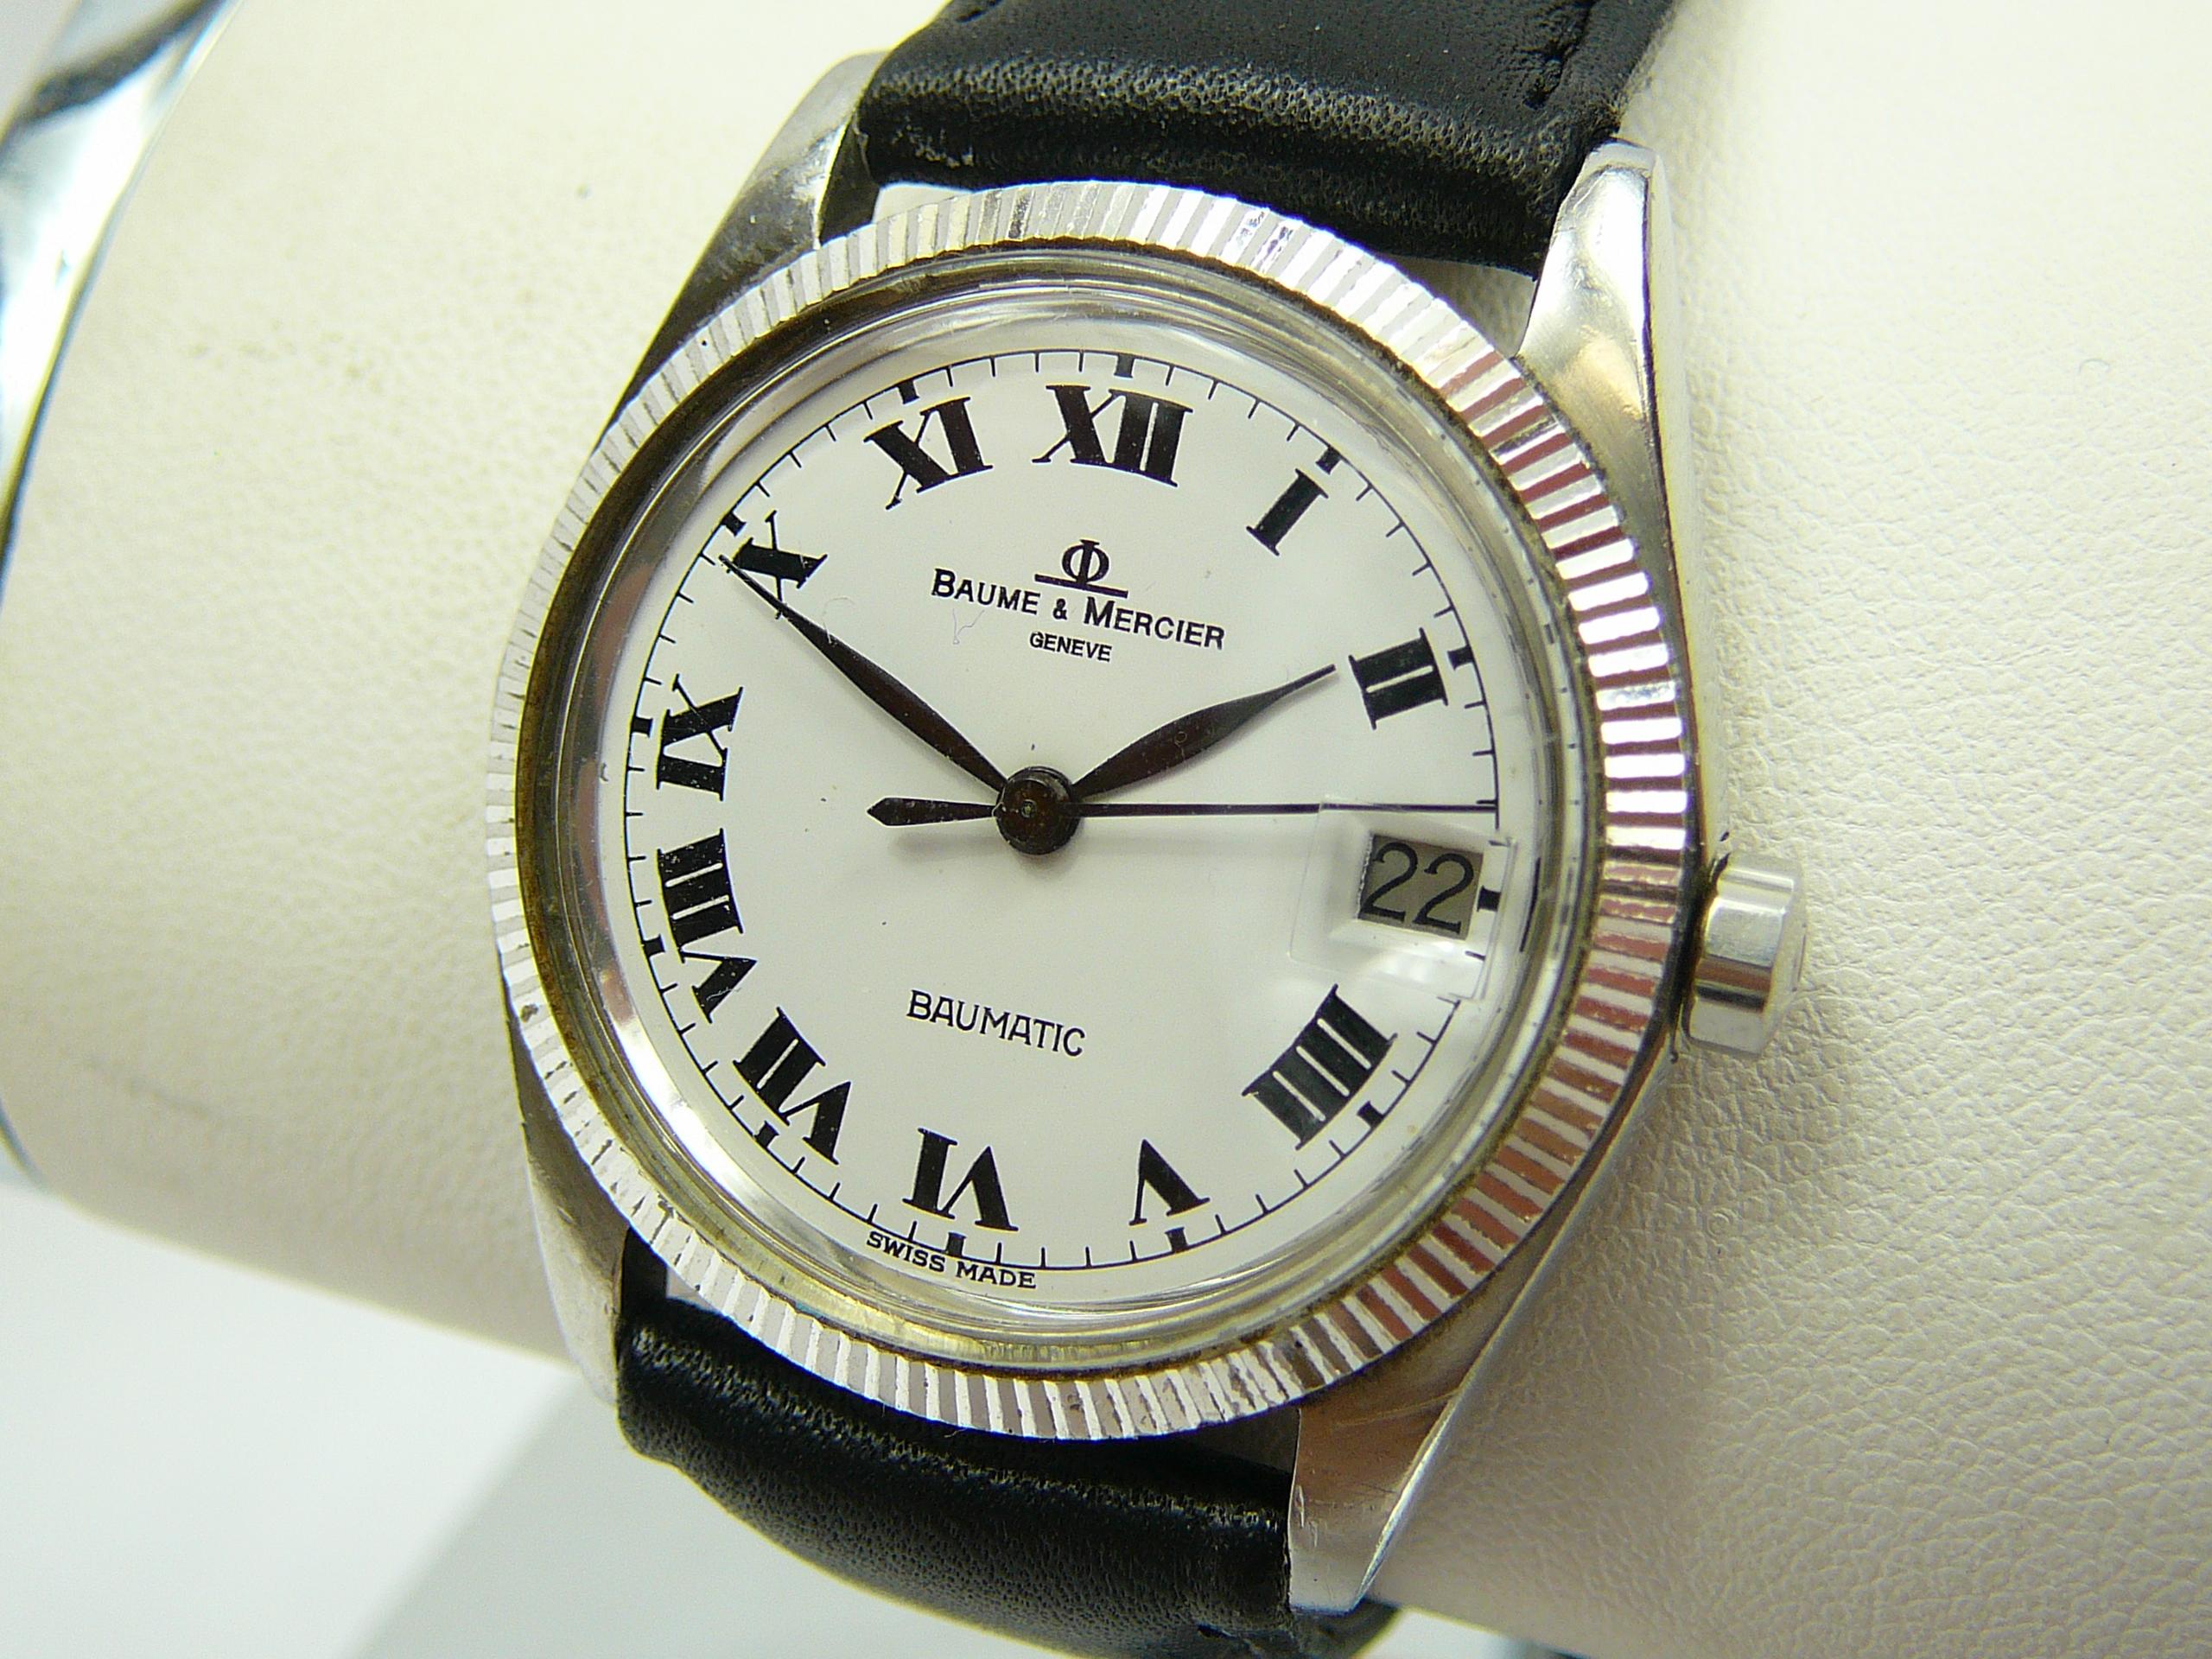 Mid Size Baume & Mercier Wrist Watch - Image 2 of 4